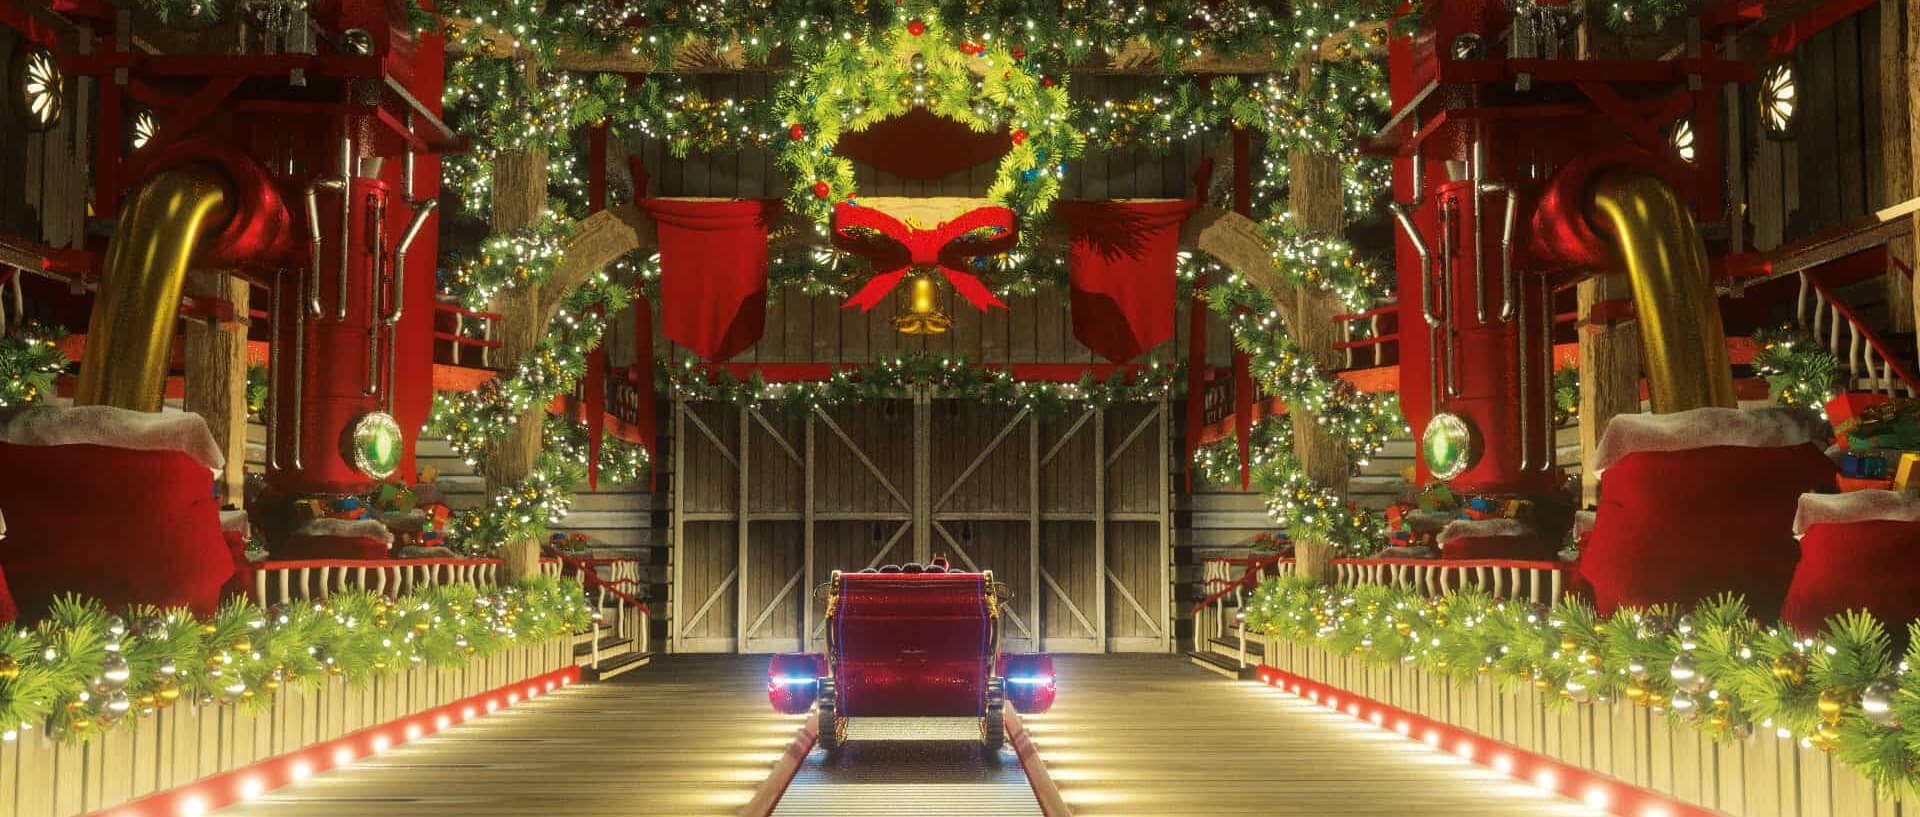 vr-sleigh-ride-4